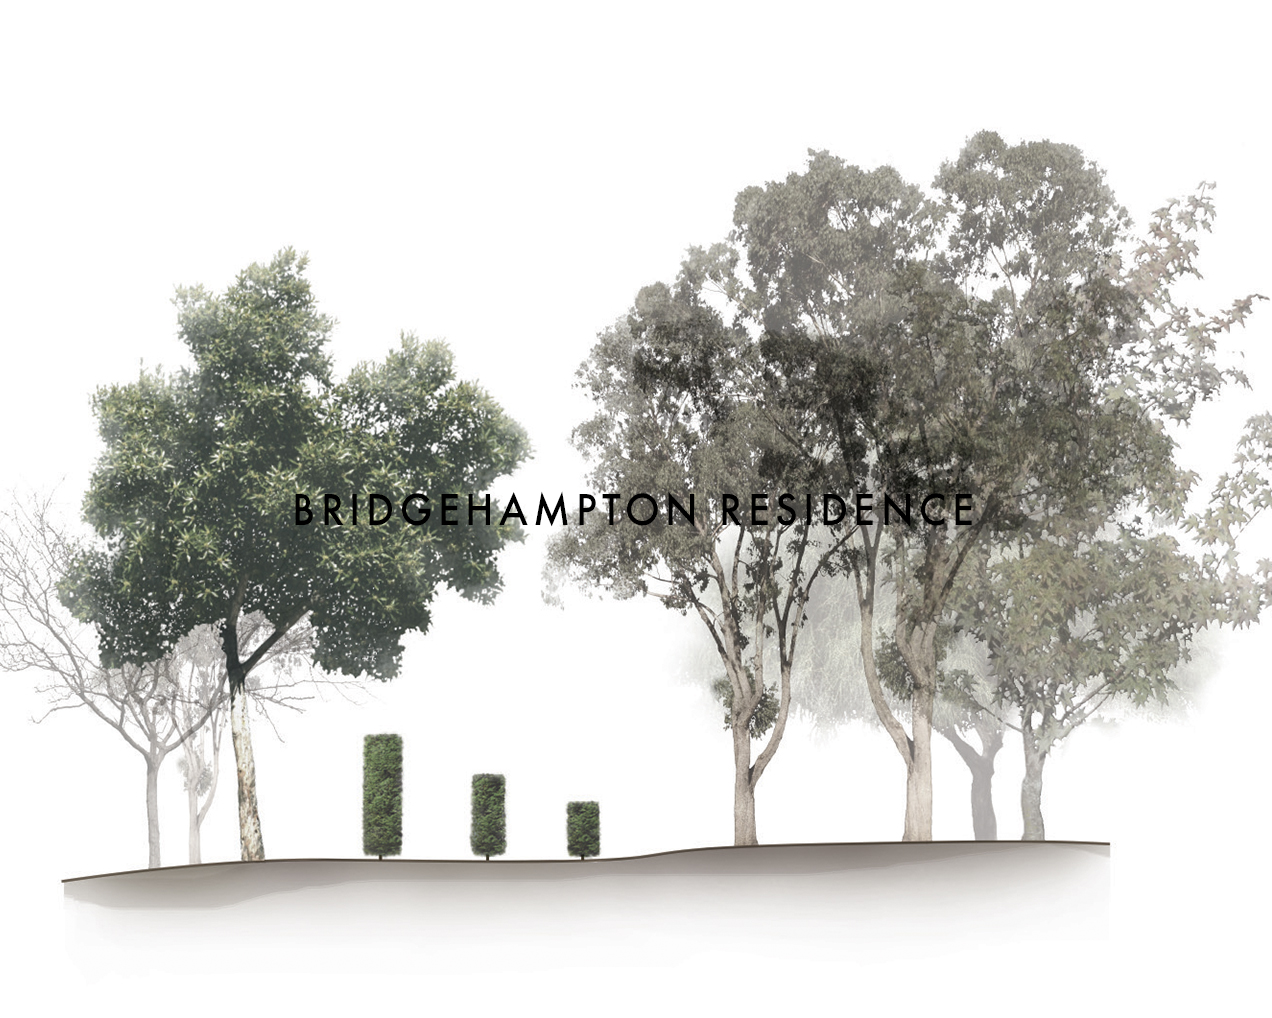 Bridgehampton Residence TITLE.jpg